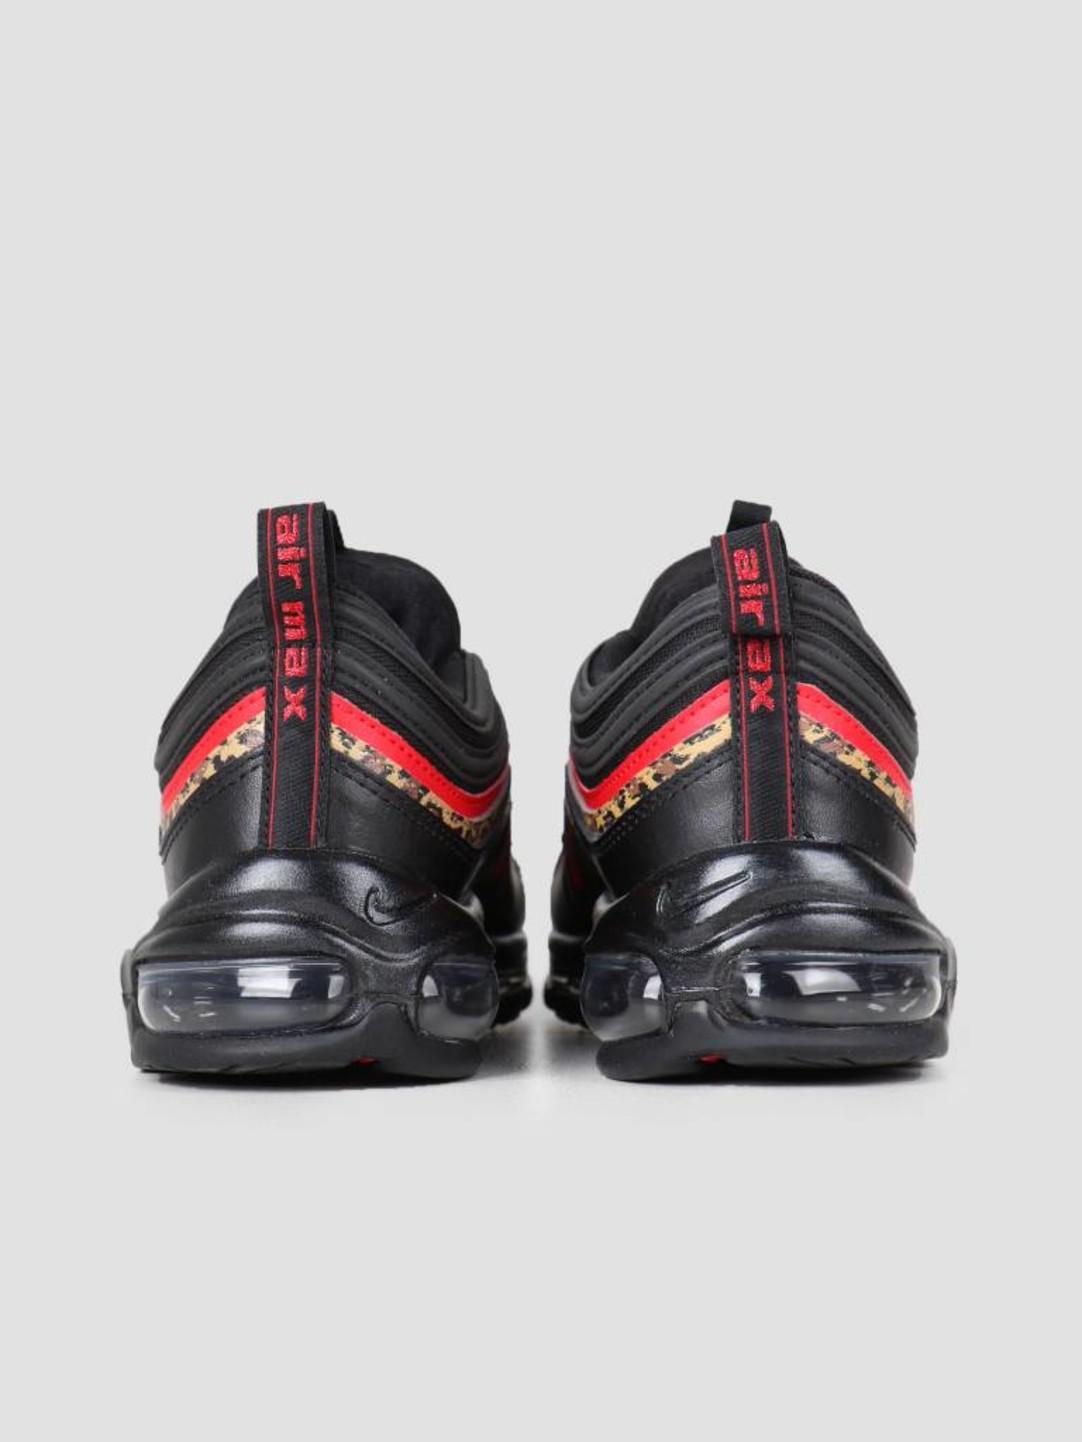 Nike Nike Air Max 97 Black University Red-Print Bv6113-001